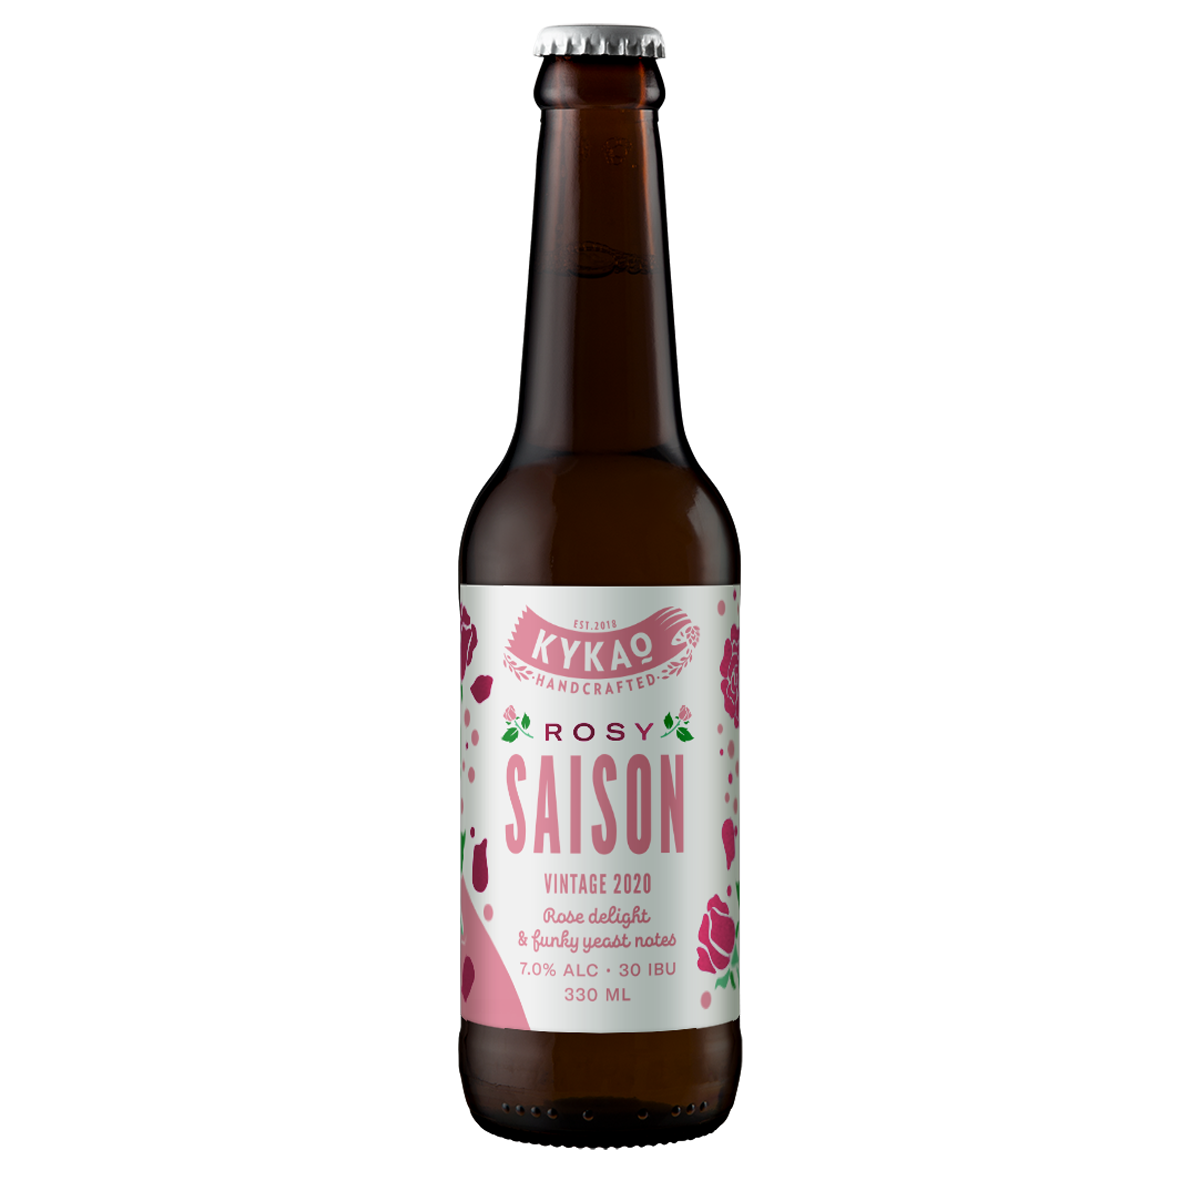 Rosy Saison